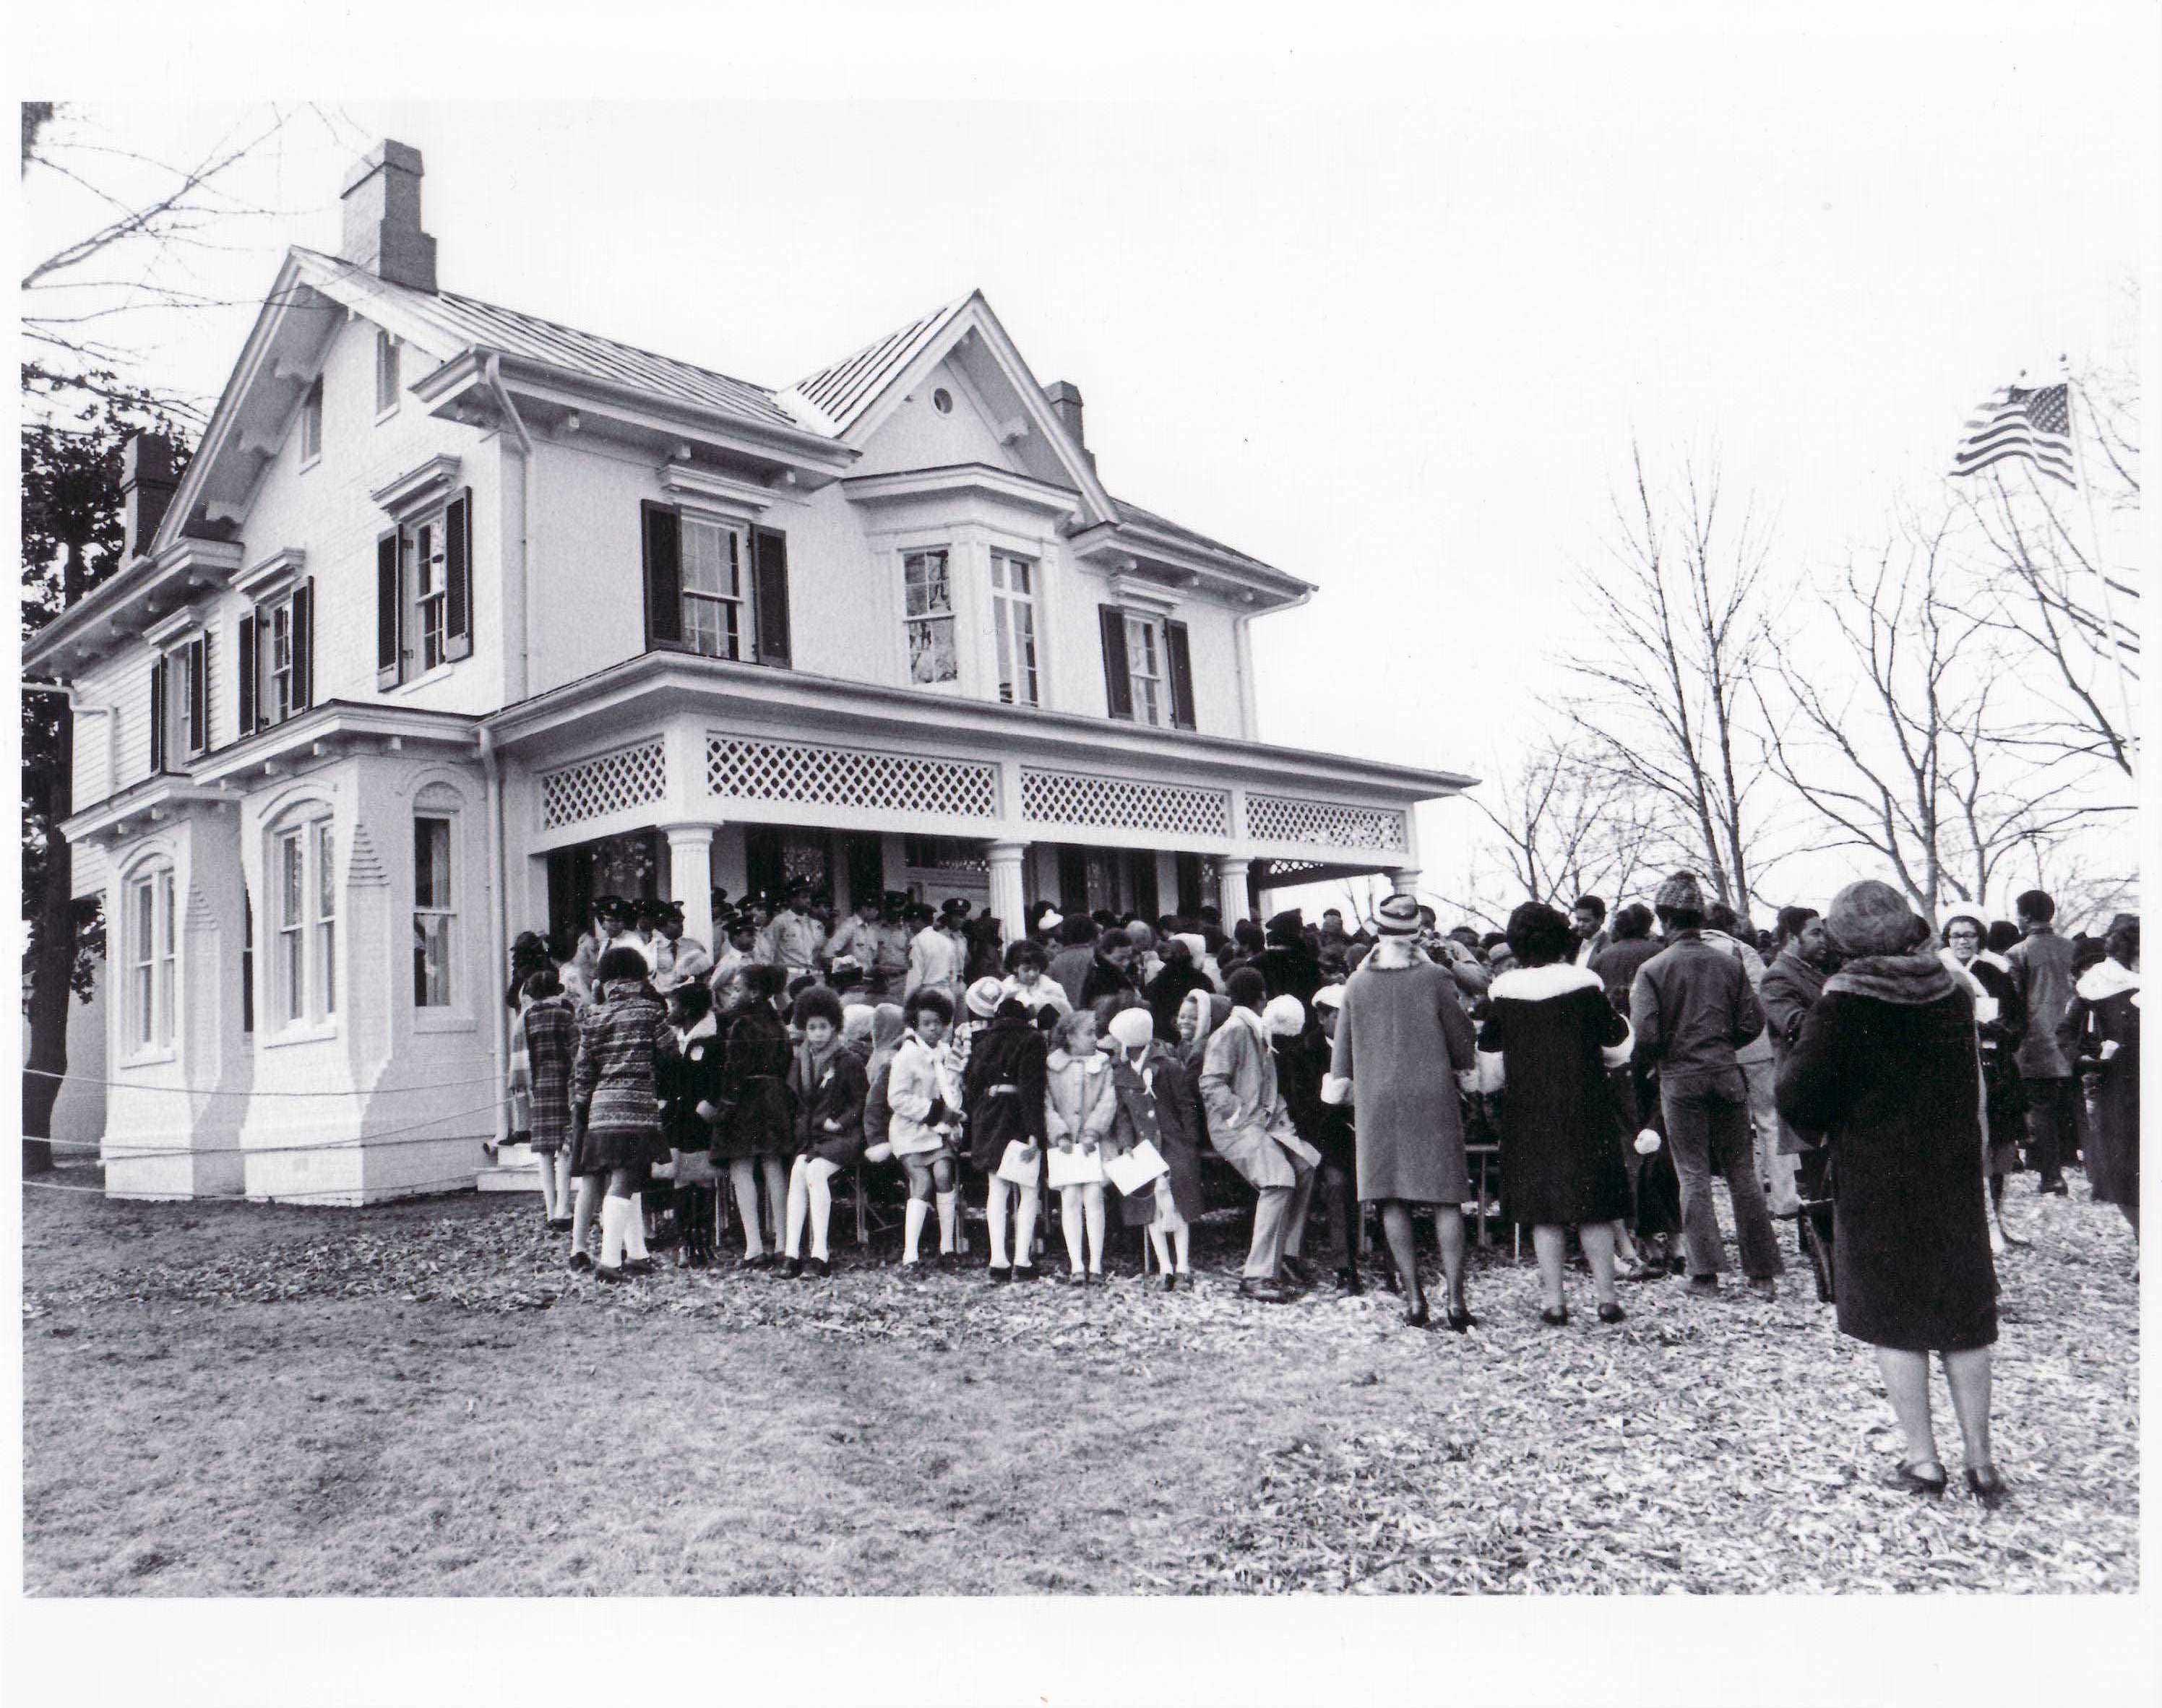 Frederick Douglass House Things To Do In Washington Dc